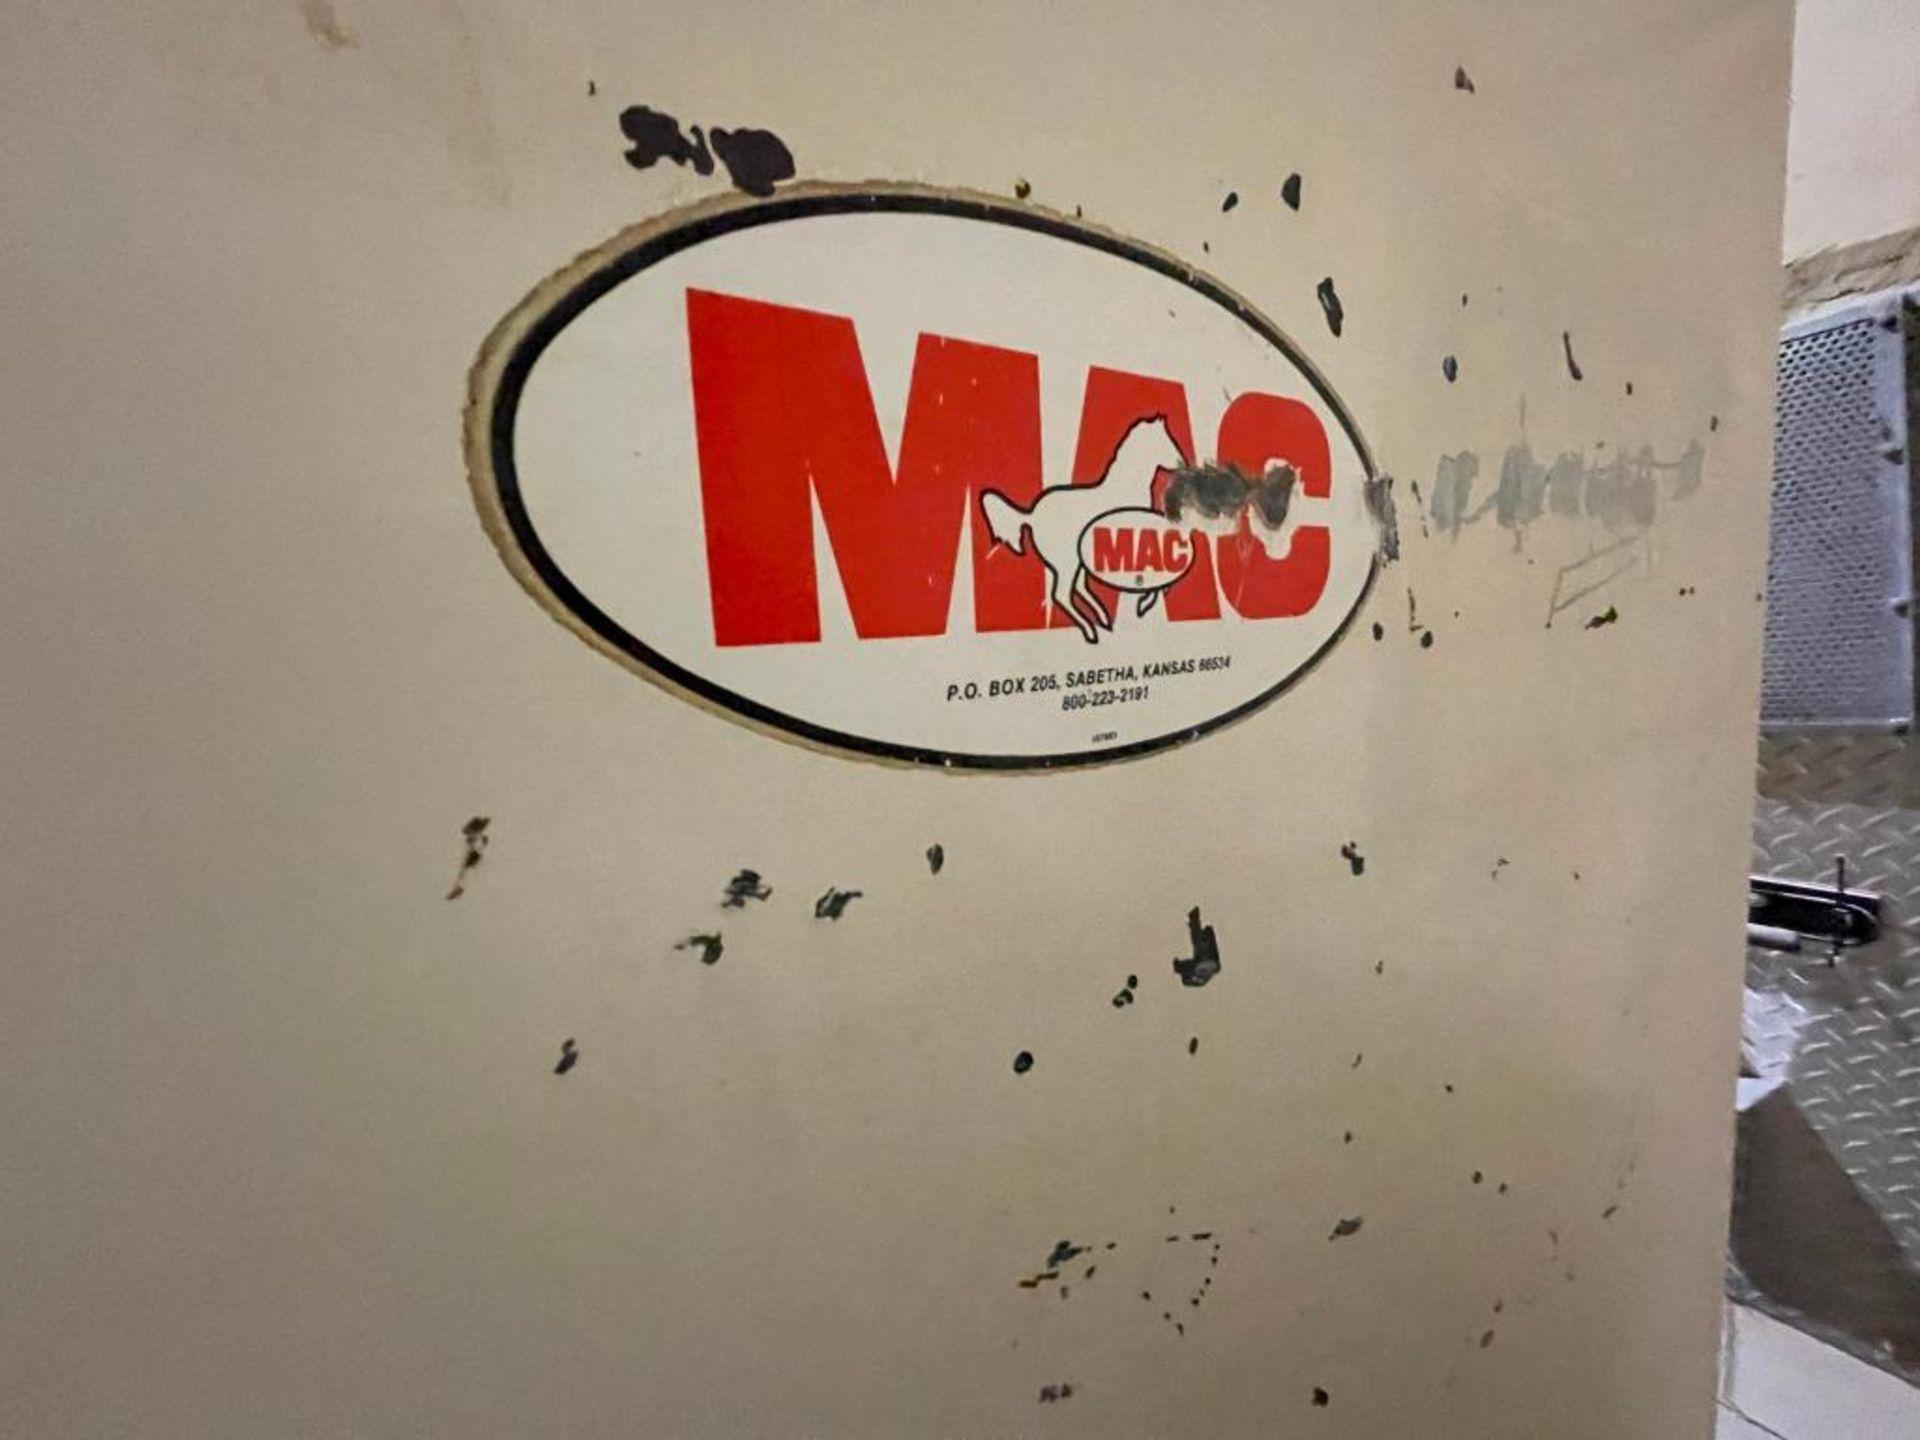 MAC dry ingredients dump station - Image 11 of 24